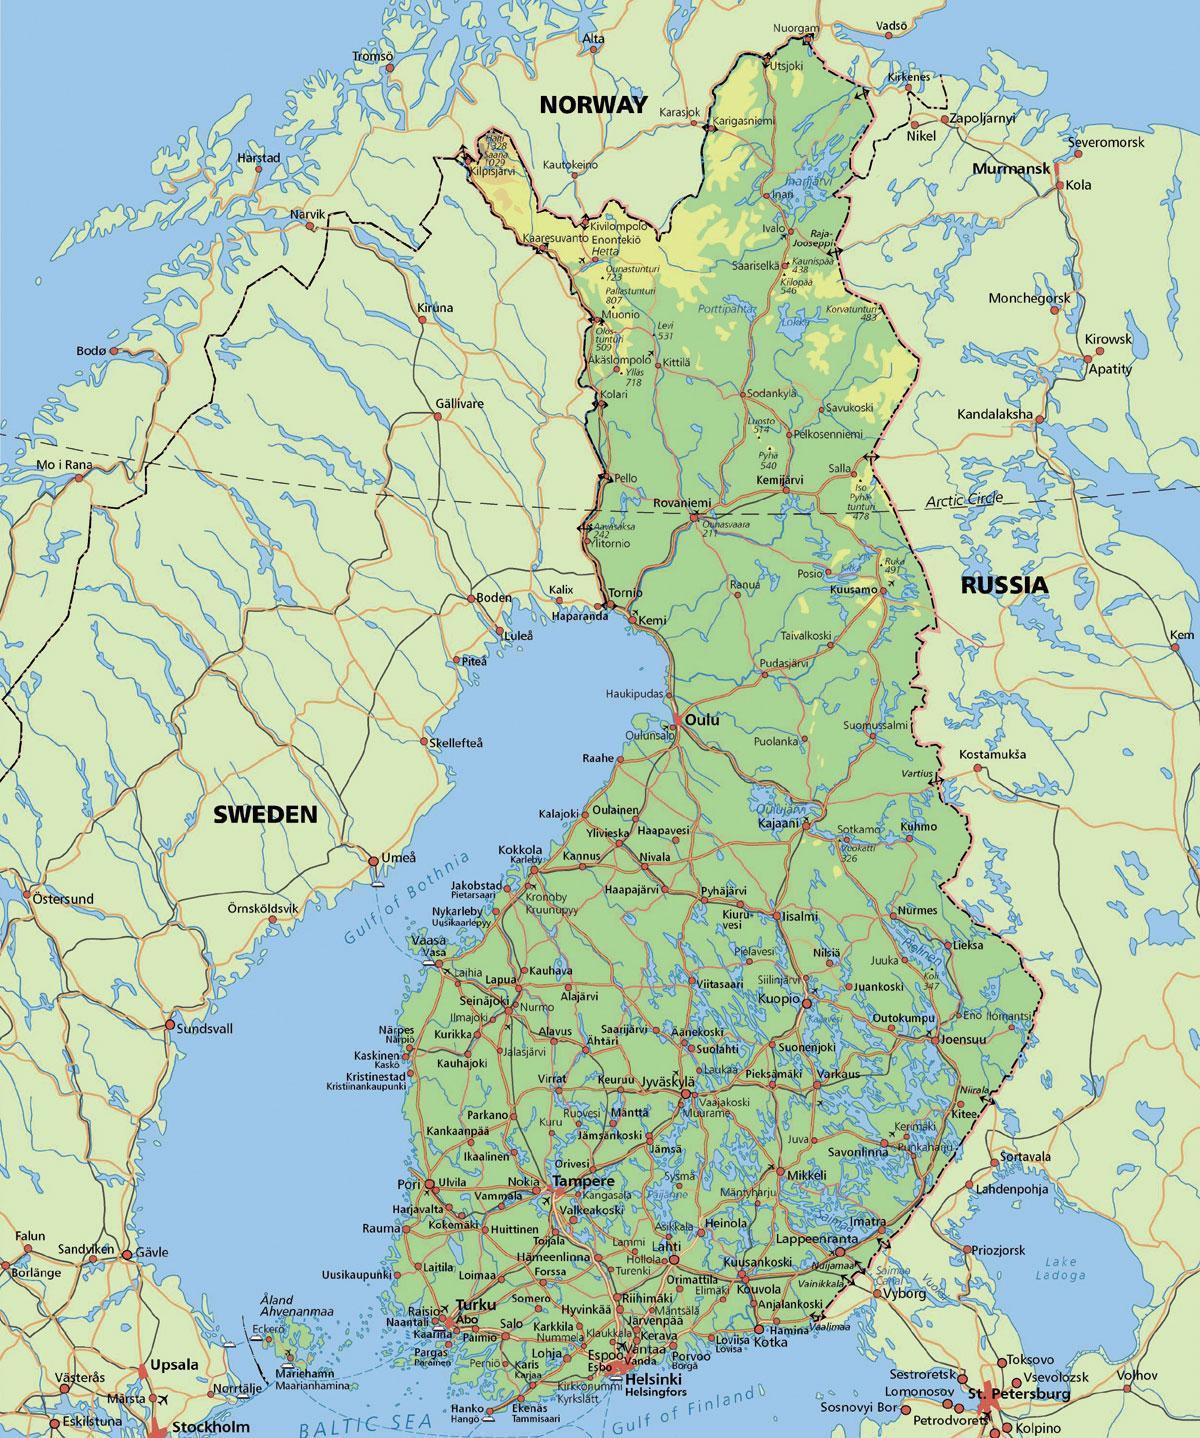 Napapiirin Suomi Kartta Kartta Arctic Circle Suomessa Pohjois